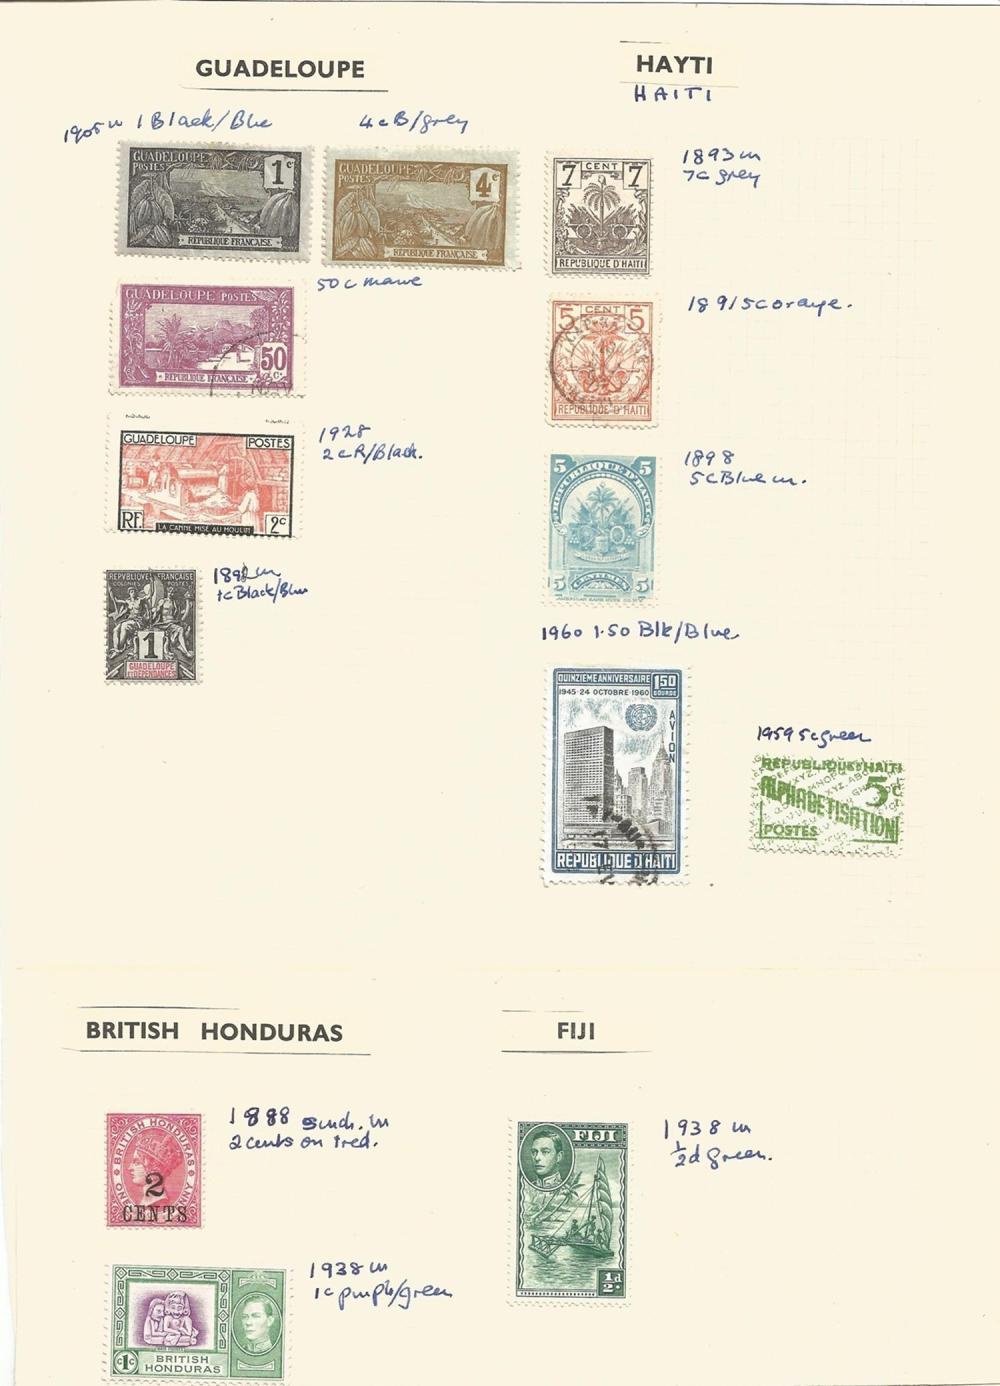 Guadeloupe, Haiti, British Honduras, Fiji, Cayman Islands, stamps on loose sheets, approx. 15.